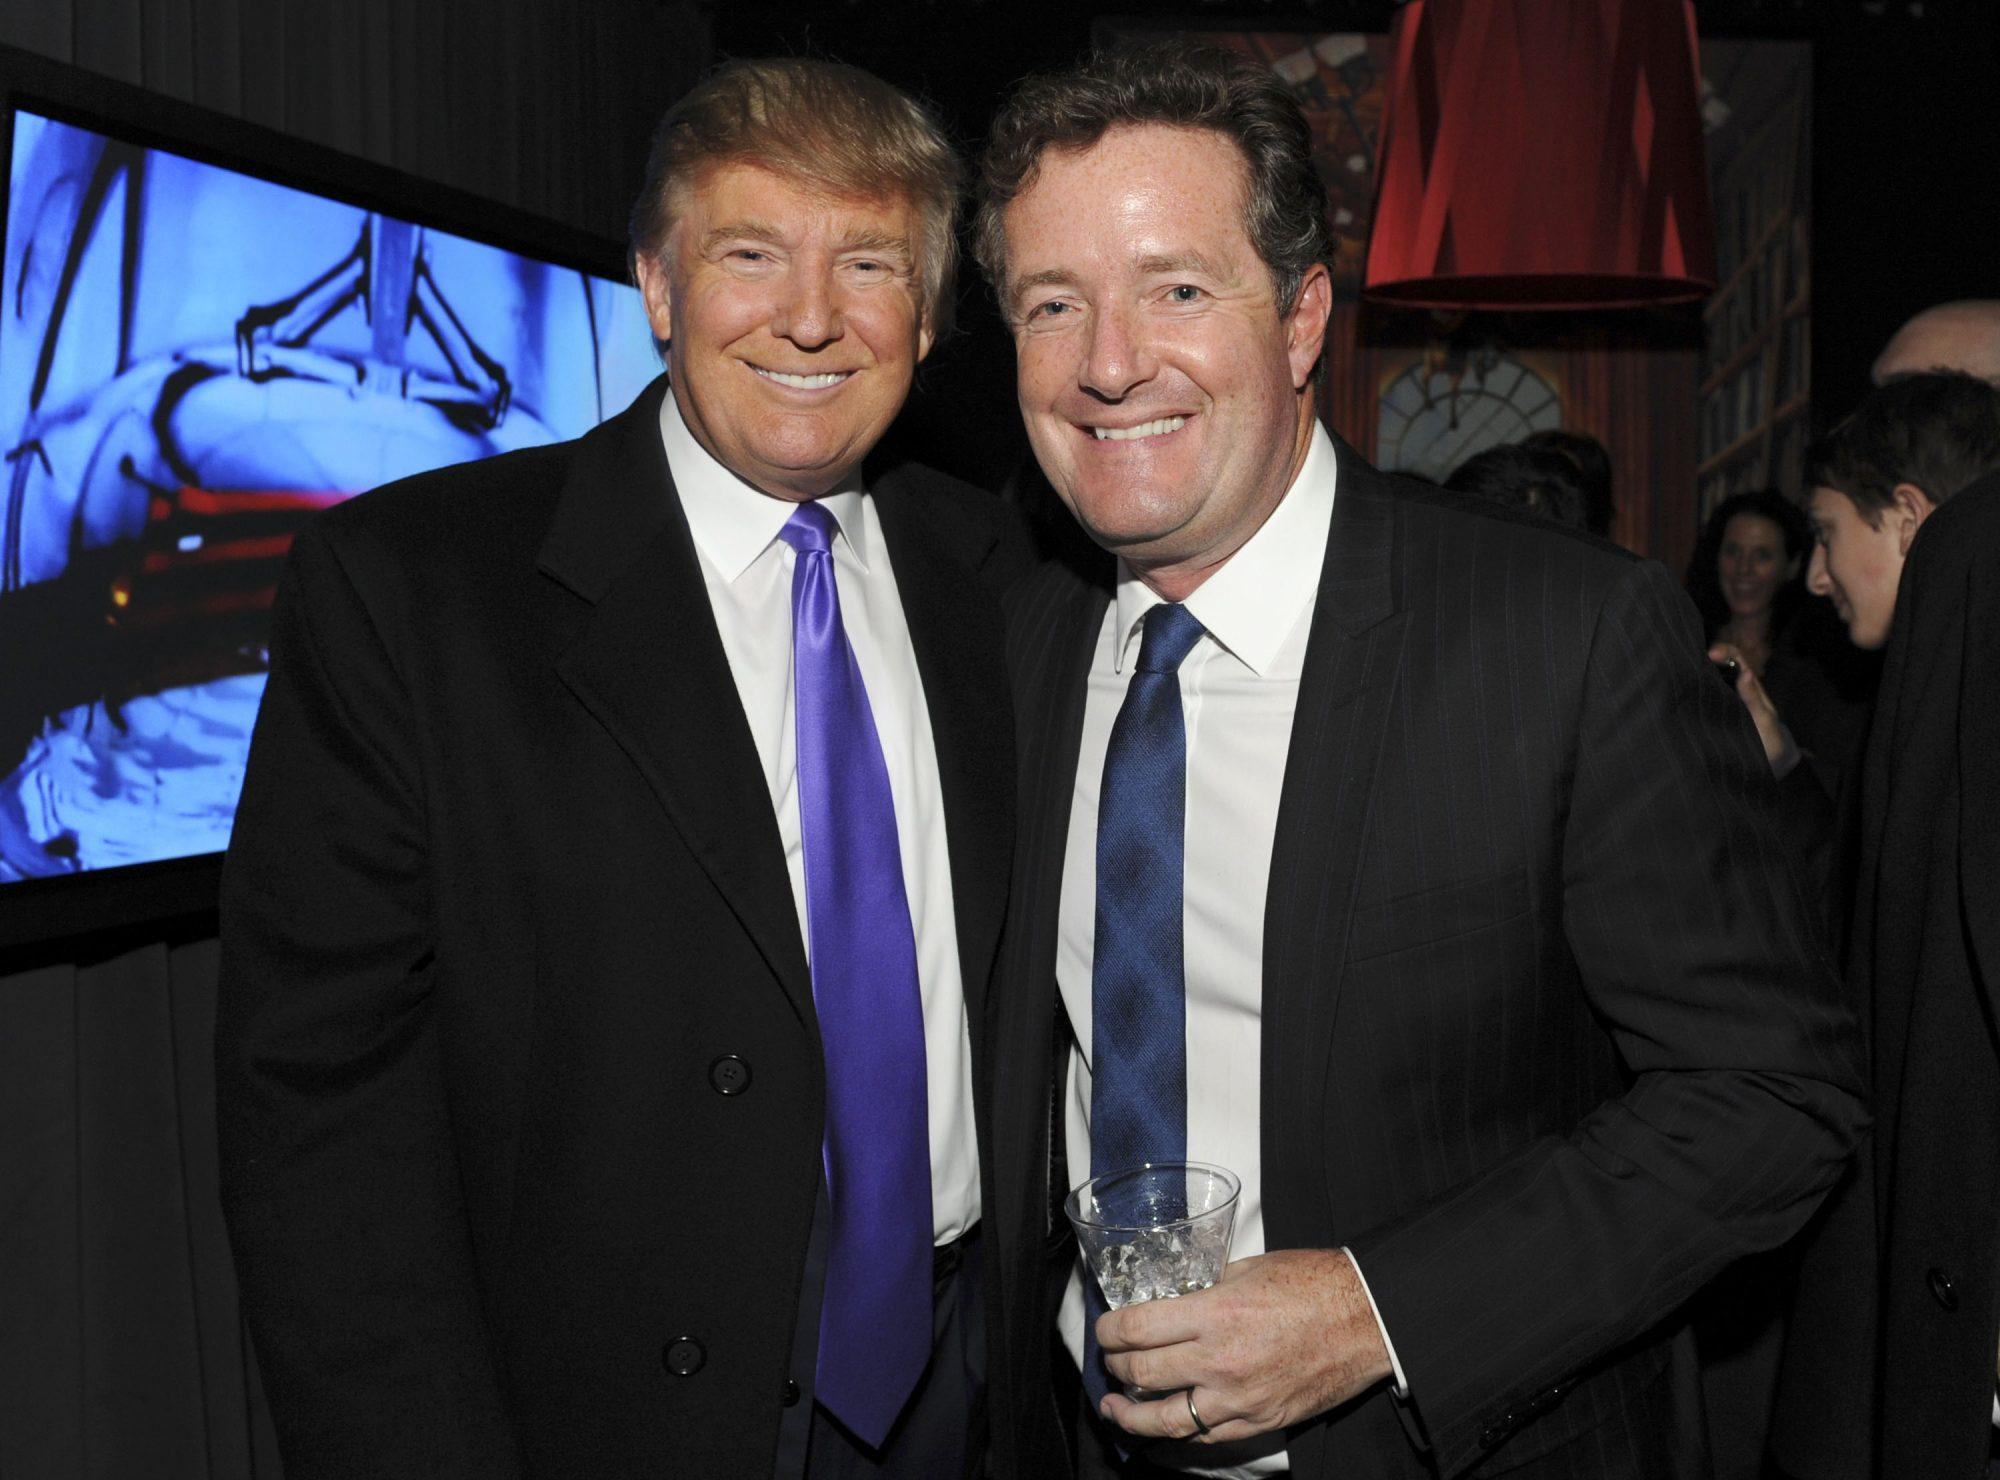 Photo of Donald Trump and Piers Morgan